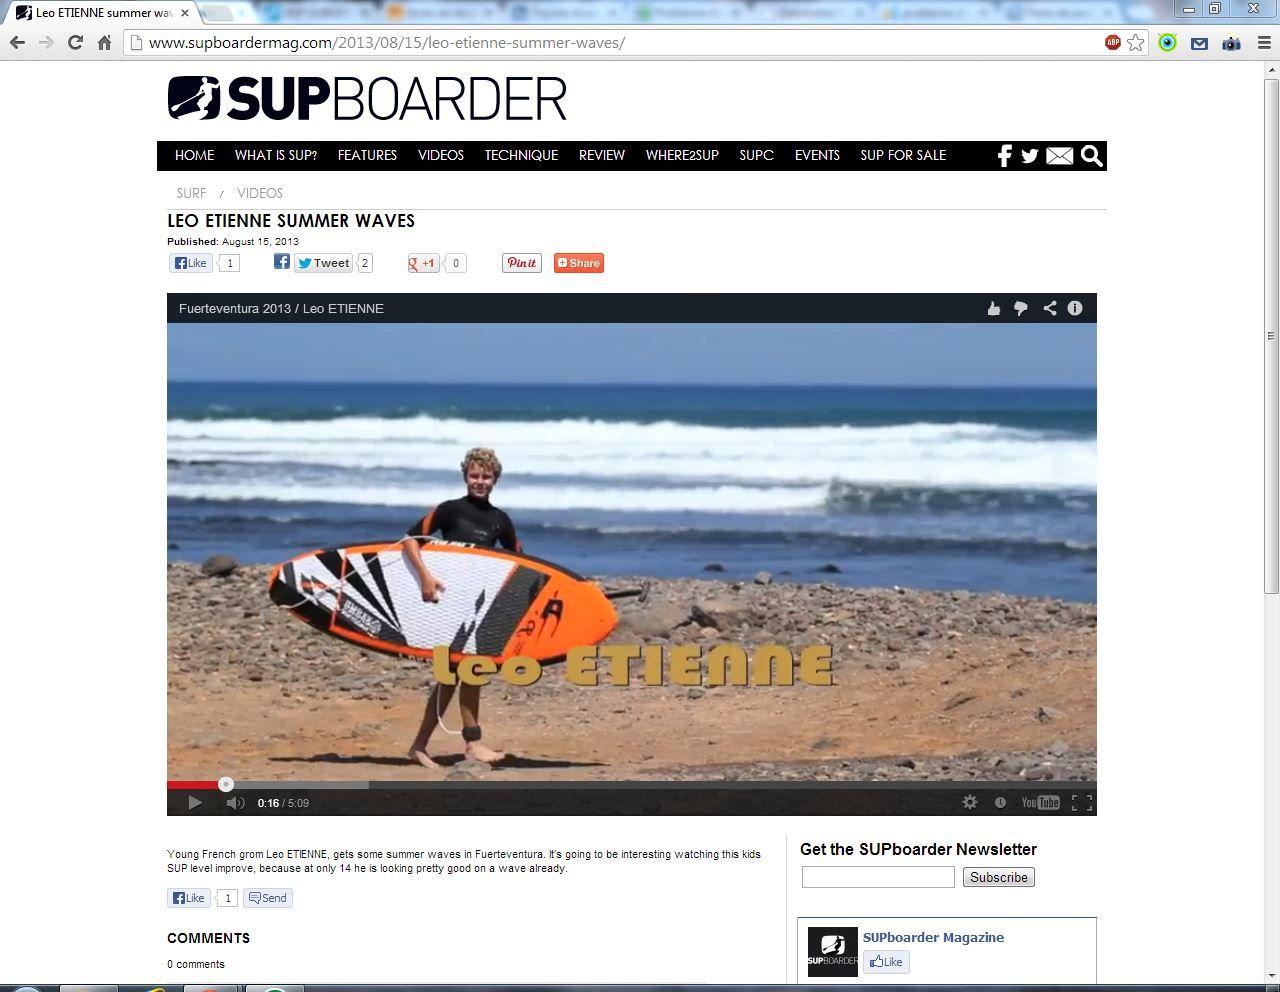 http://ist2011.over-blog.com/article-interview-leo-paul-etienne-champion-de-guadeloupe-sup-surf-120347424.html